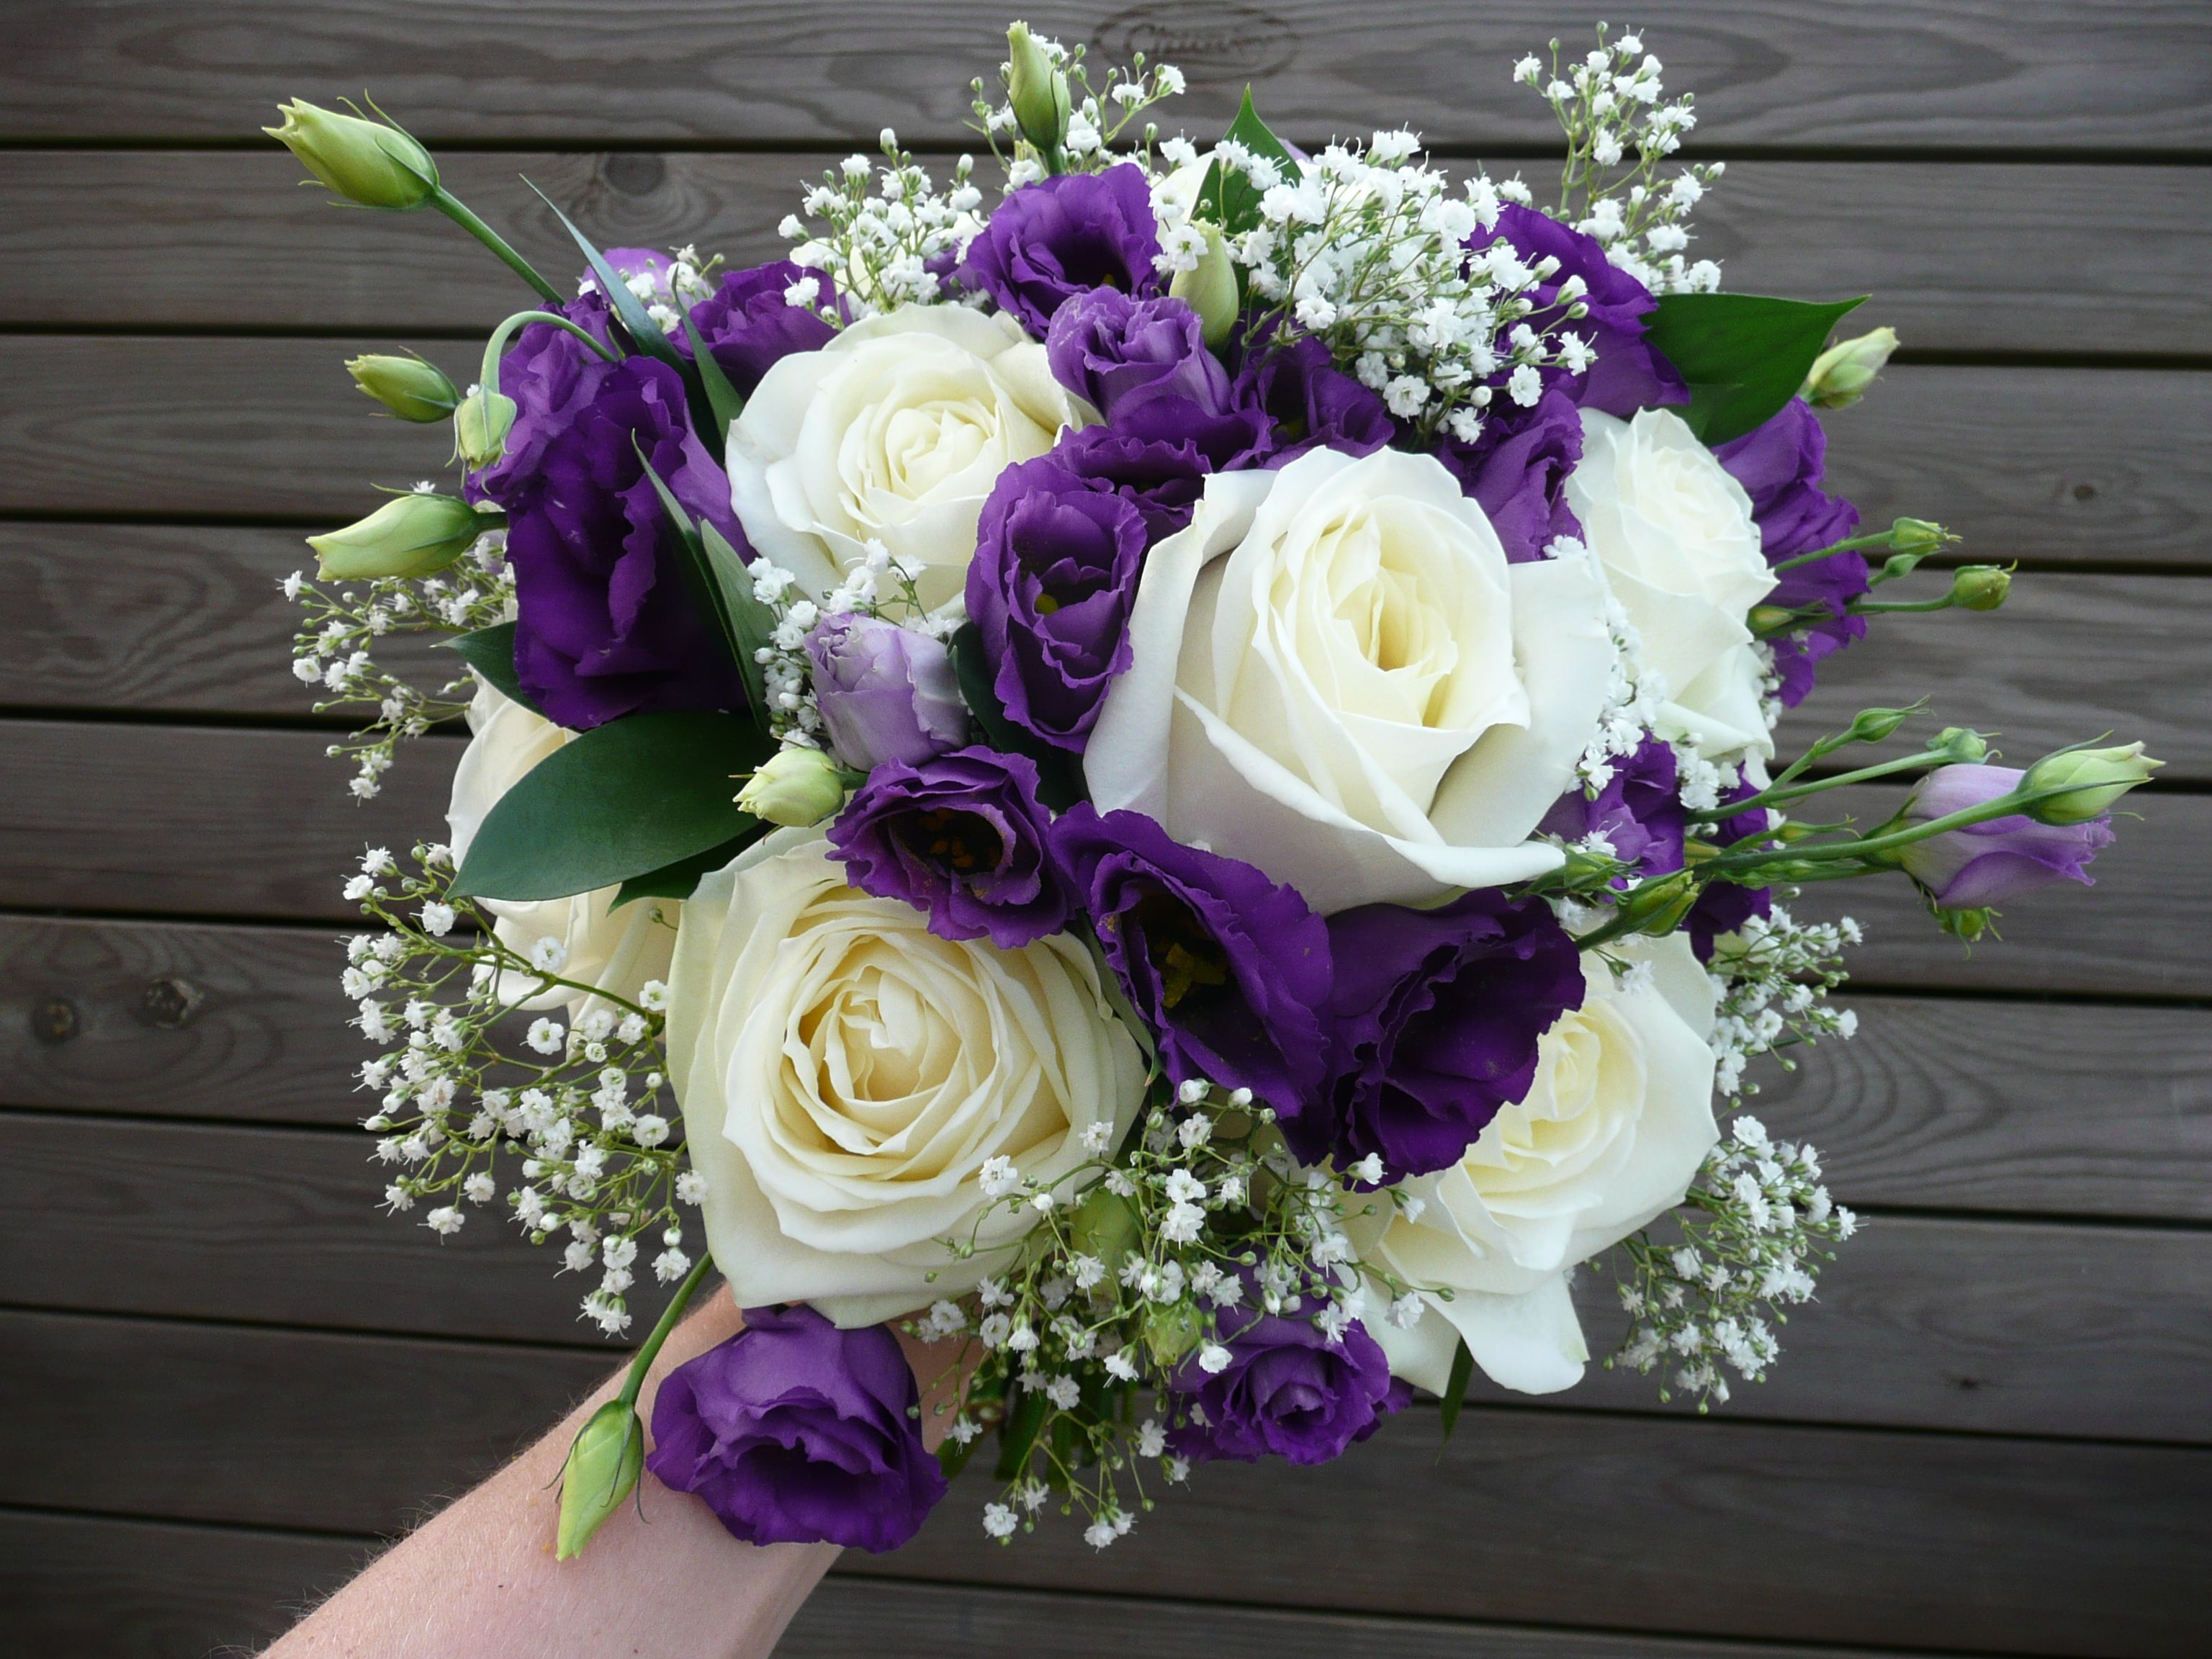 Large white rose, purple lisianthus, gypsophila and ruscus